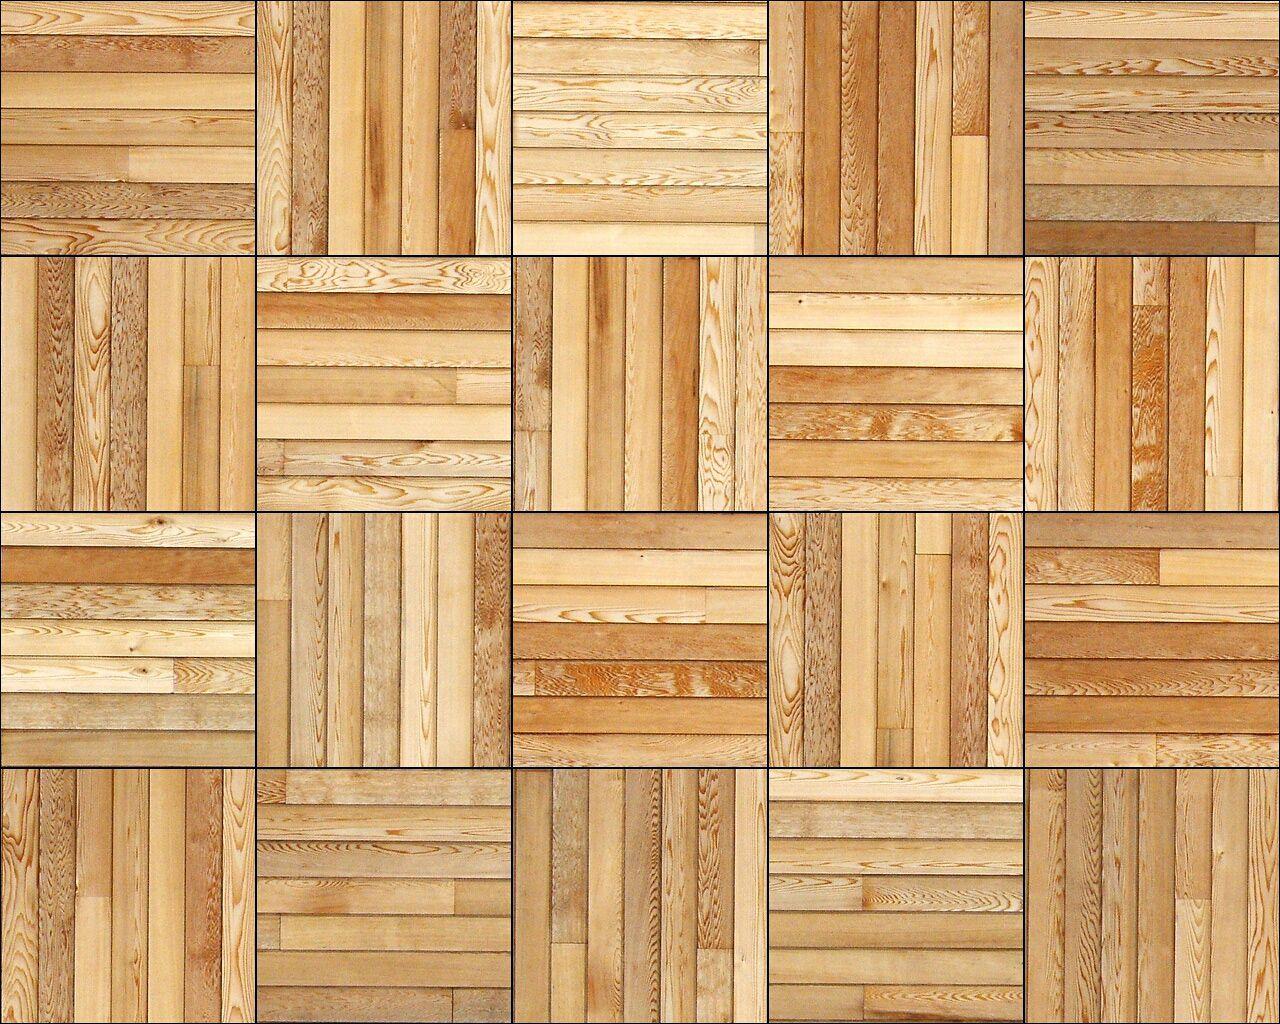 Flooring : Good Wood Floor Tiles With Tile Wood Floor Texture Best Tiles  For Kitchen In India ZNanie